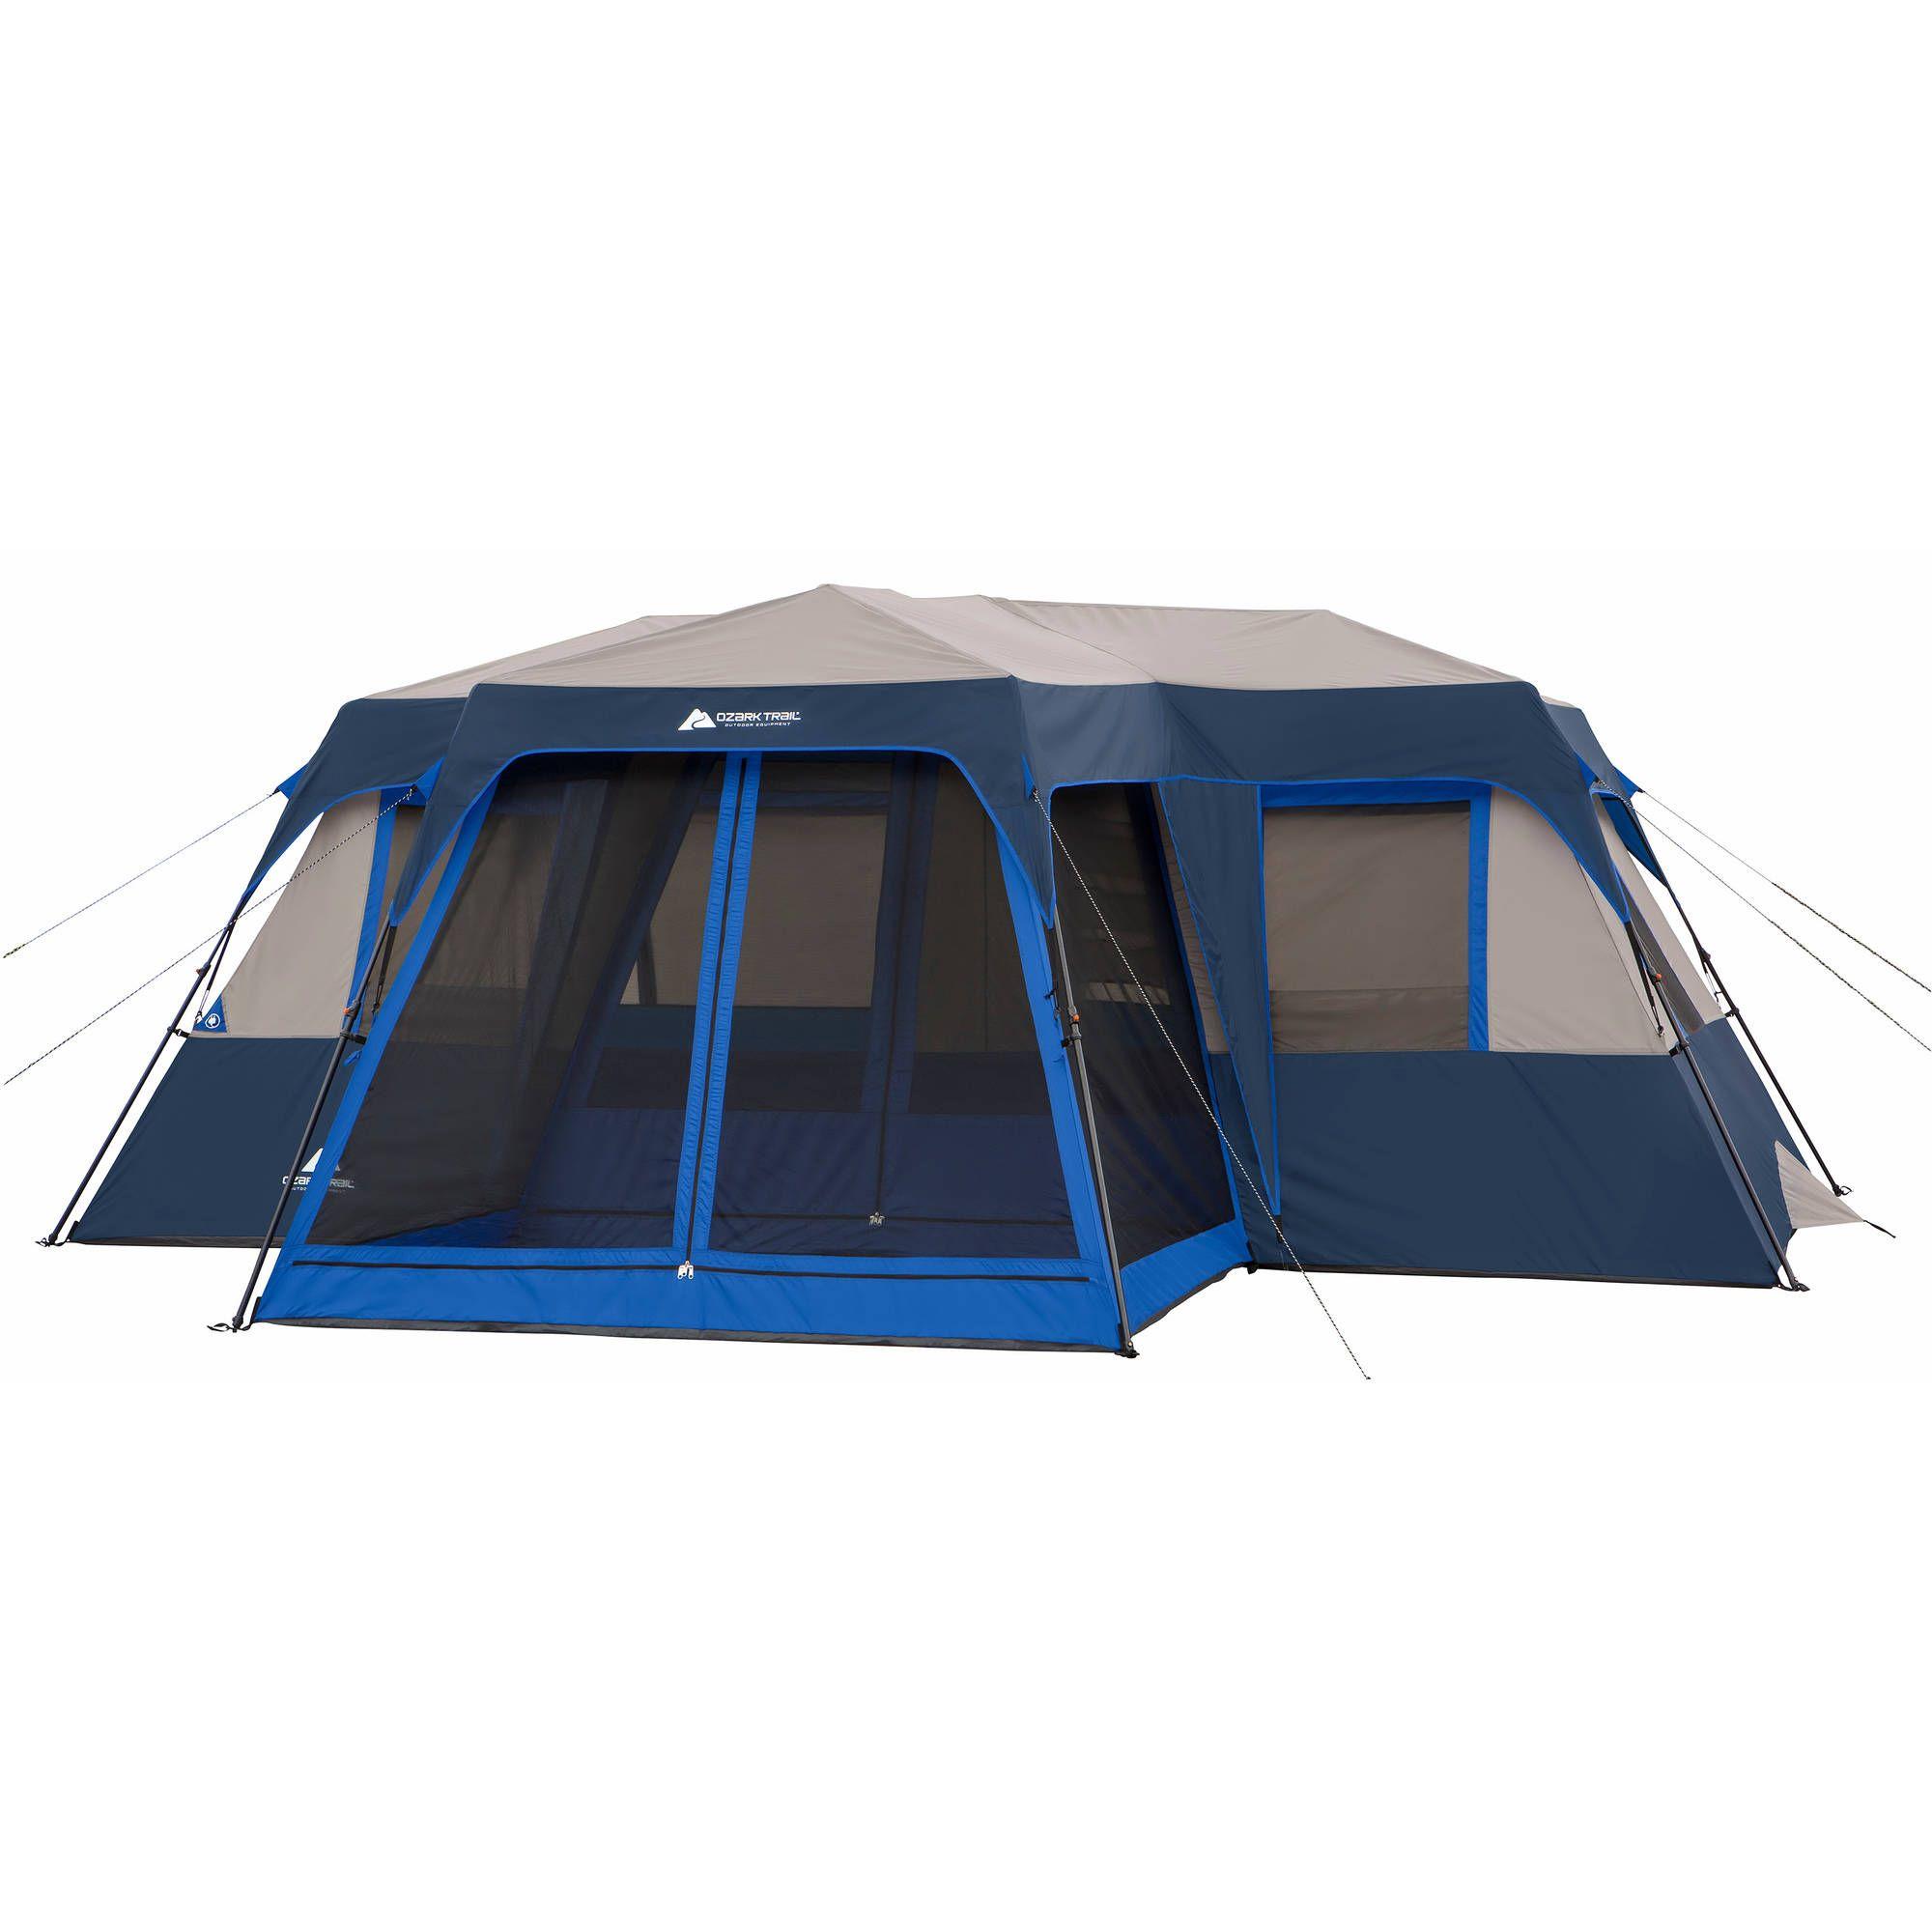 Ozark Trail 12 Person 2 Room Instant Cabin Tent with Screen Room - Walmart.com  sc 1 st  Pinterest & Ozark Trail 12 Person 2 Room Instant Cabin Tent with Screen Room ...